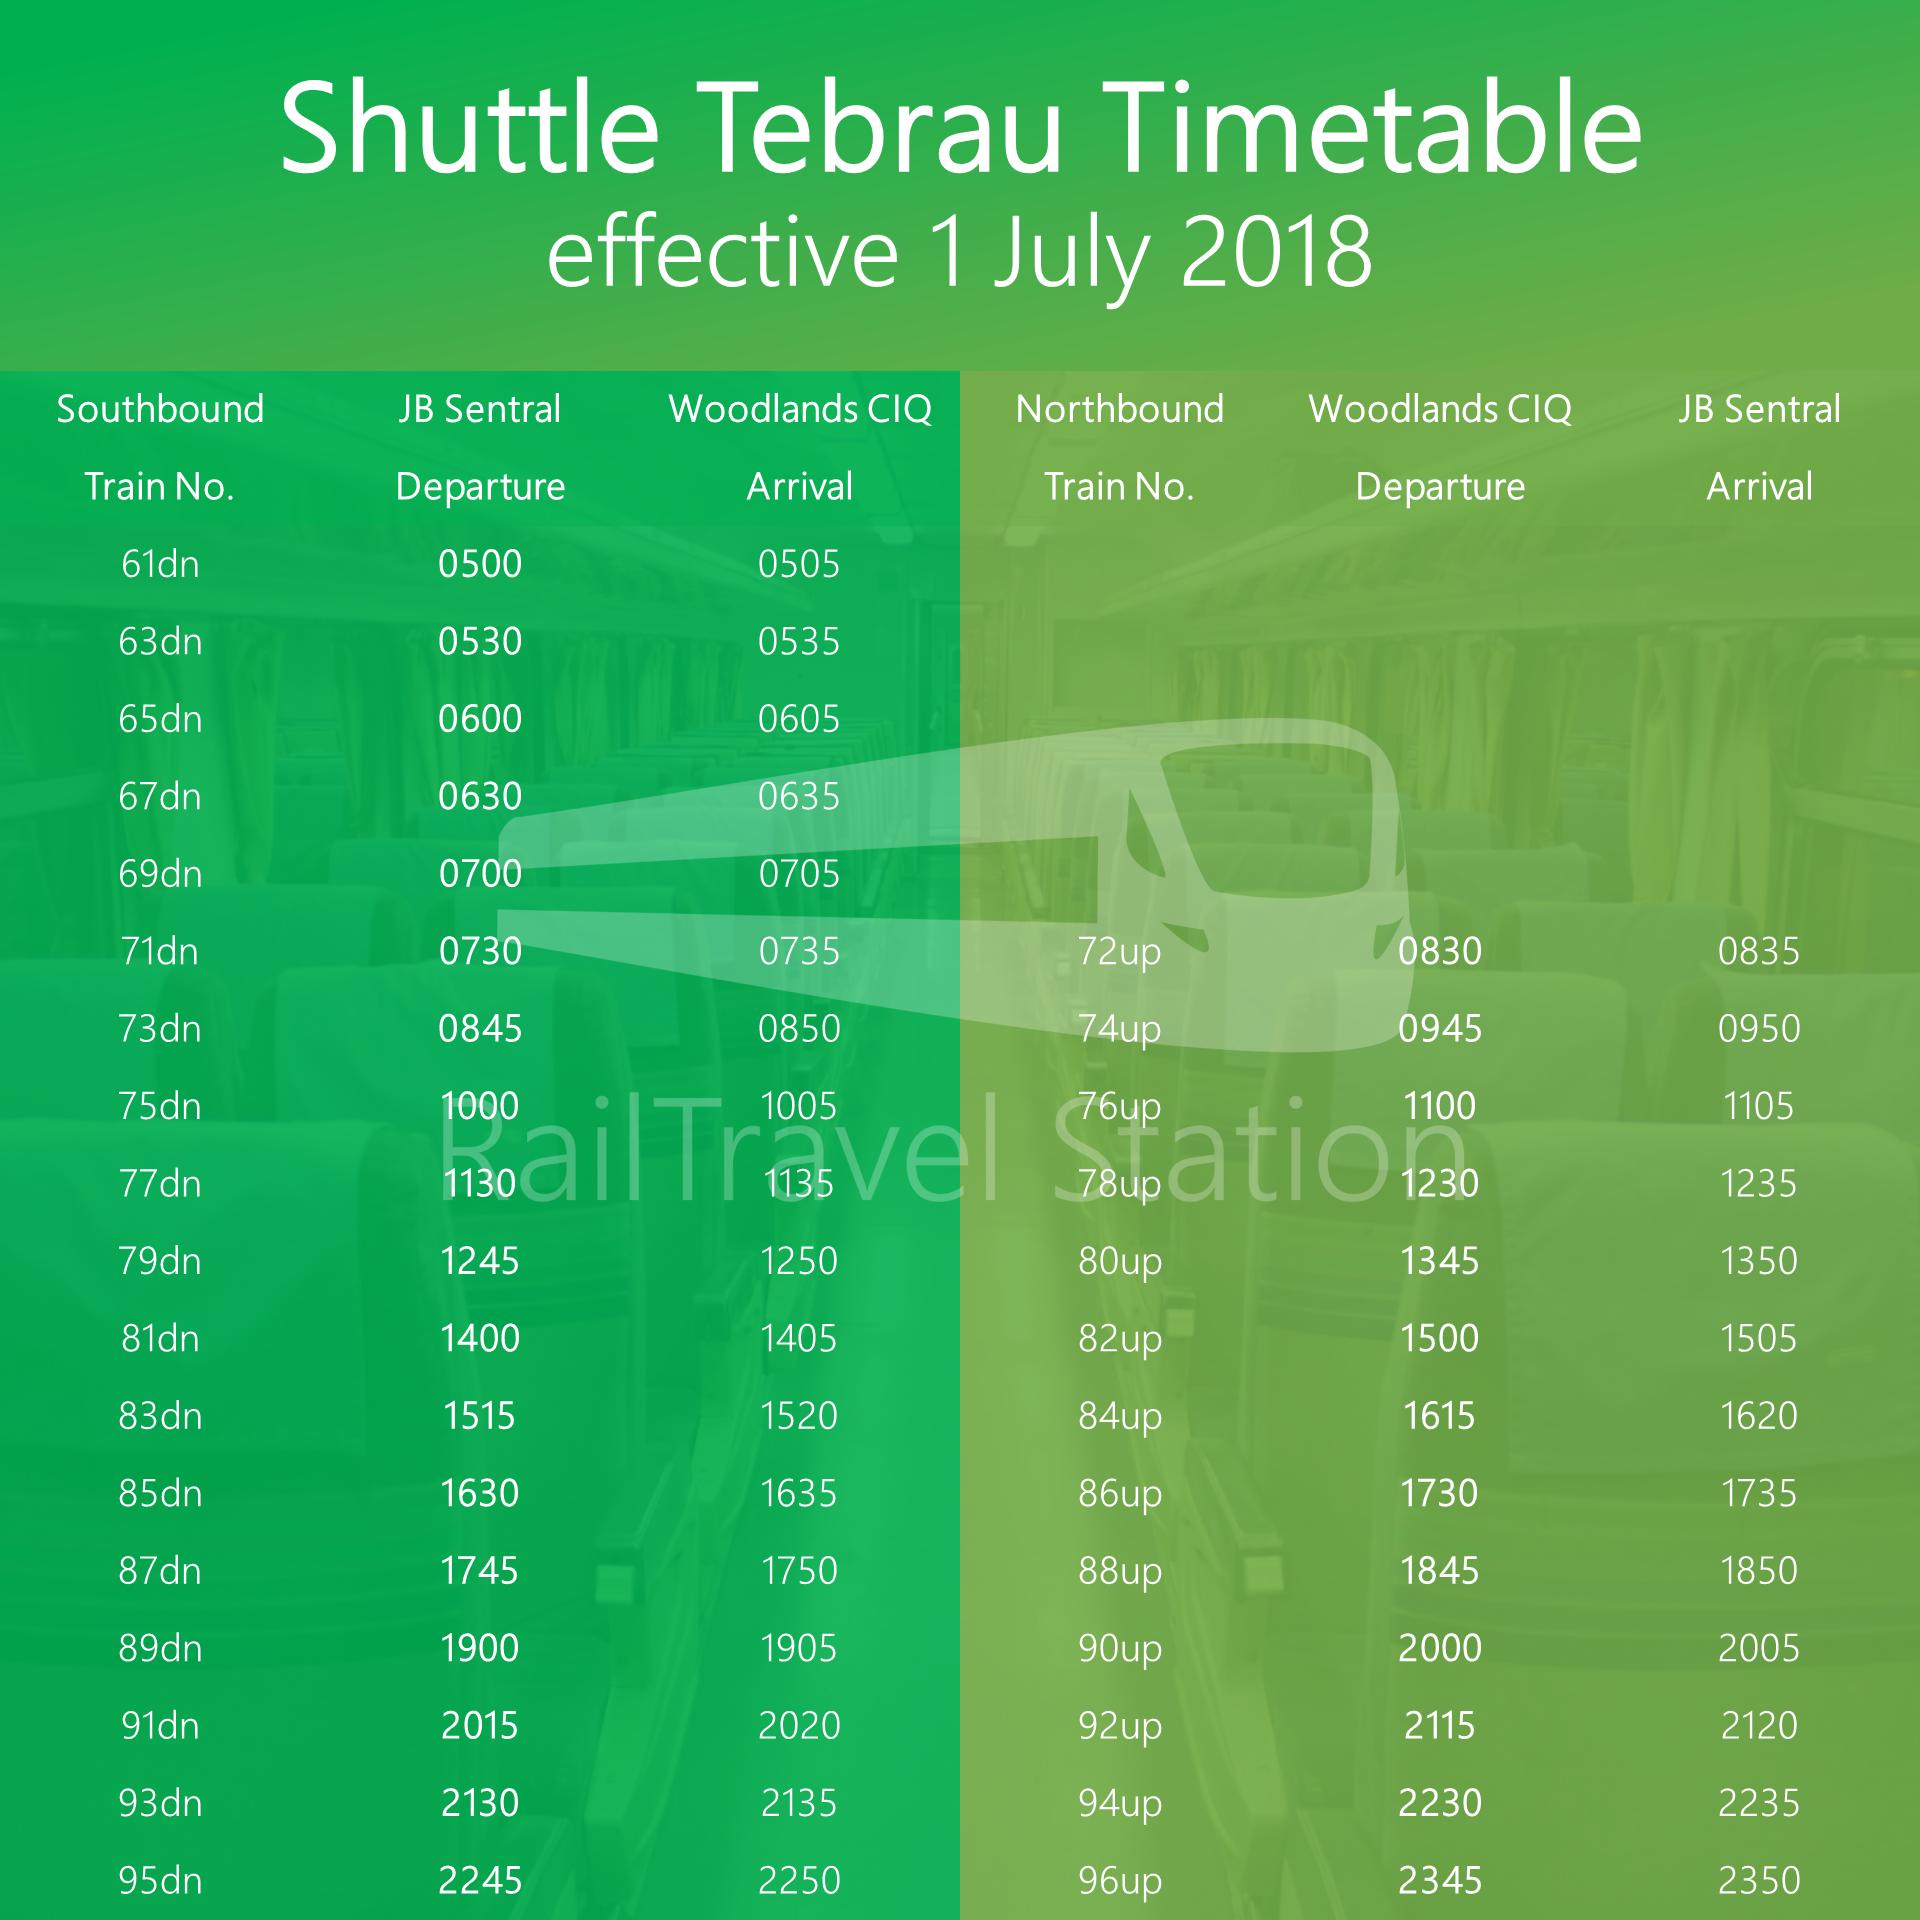 Ktm Shuttle Tebrau